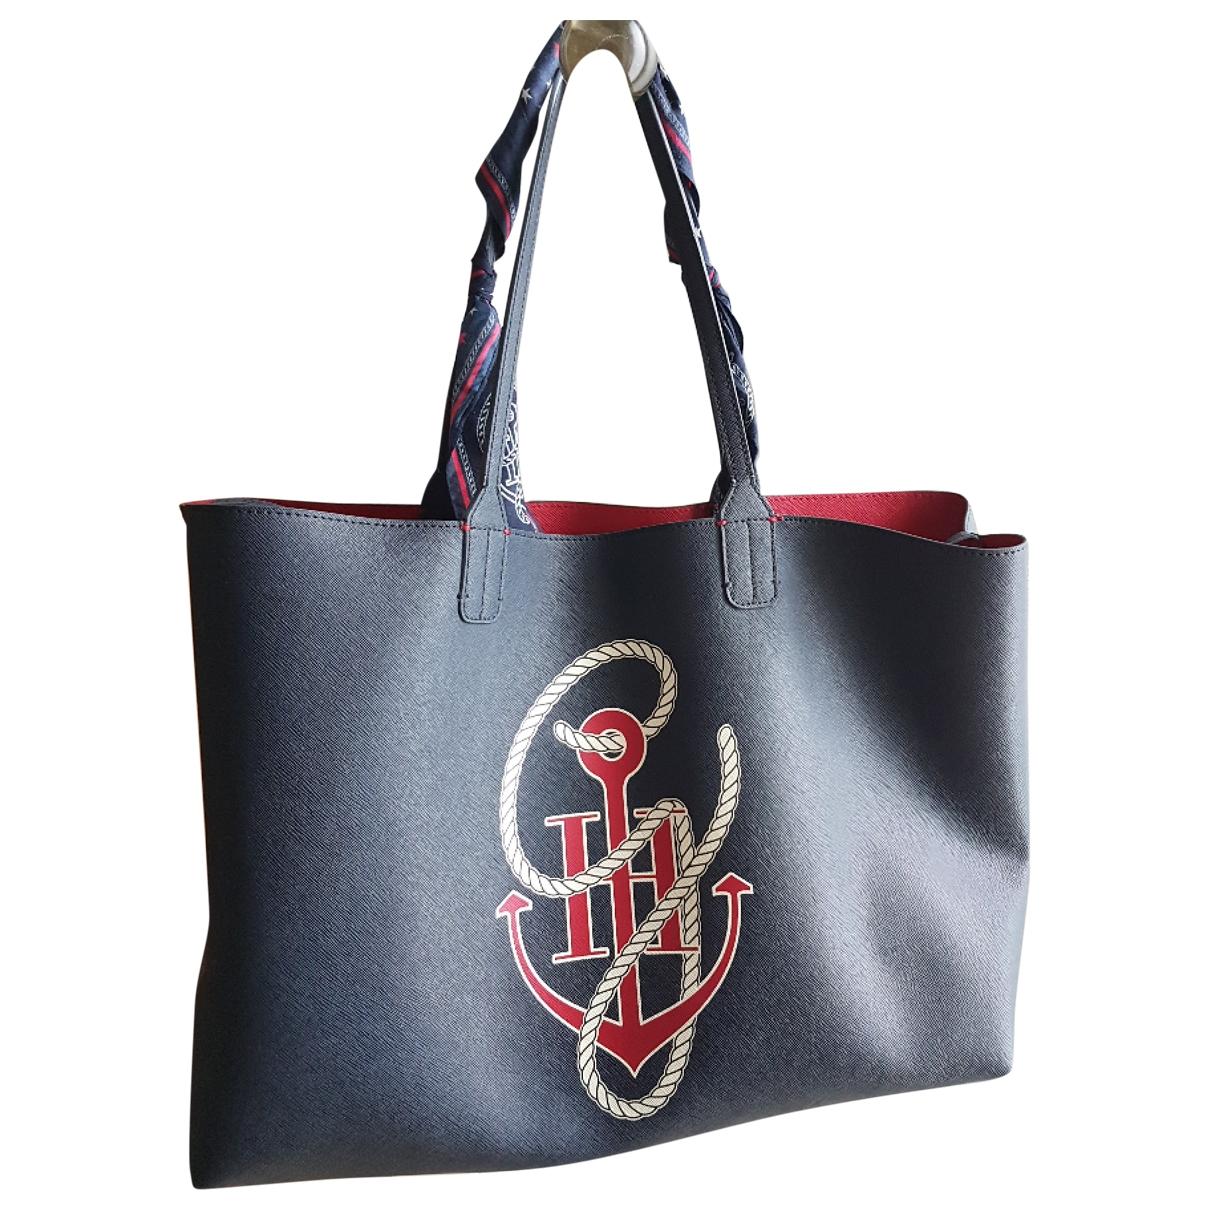 Tommy Hilfiger \N Blue Leather handbag for Women \N